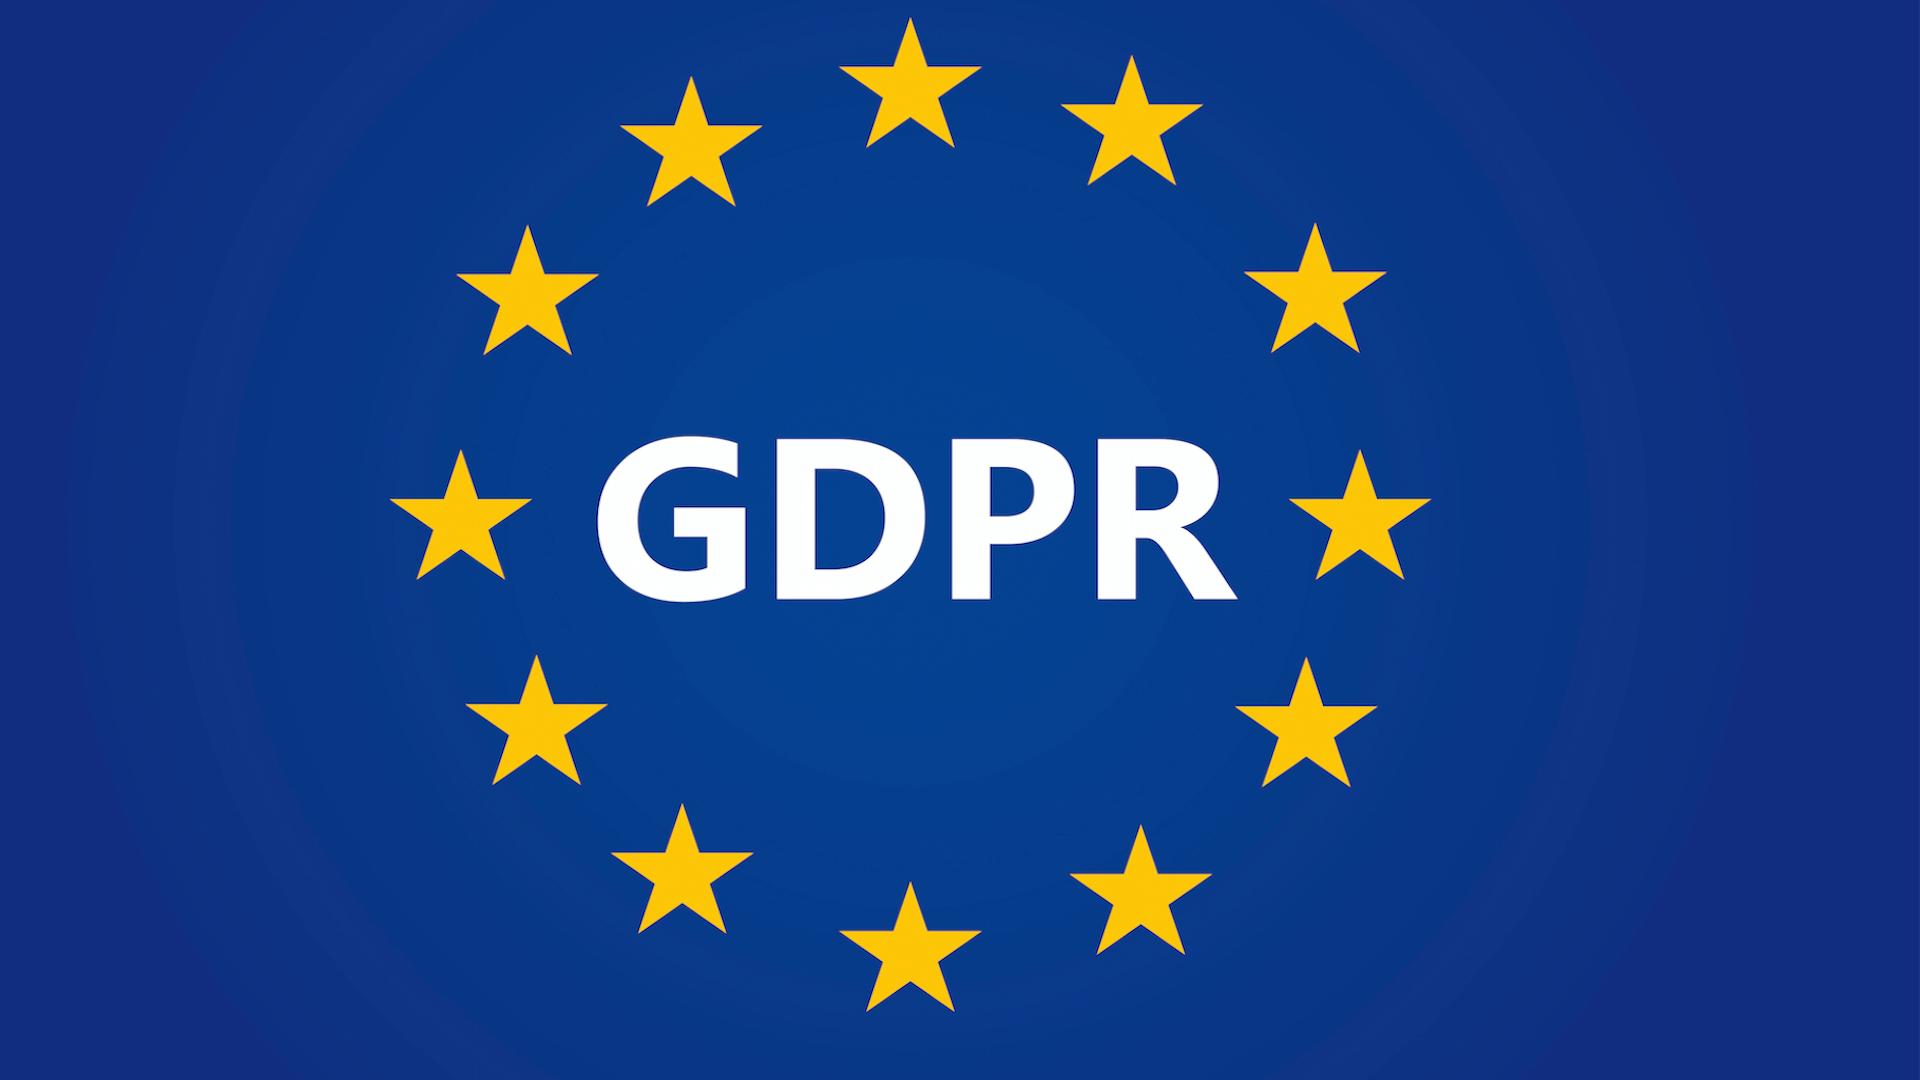 GDPR compliance for ecommerce businesses | Littledata blog